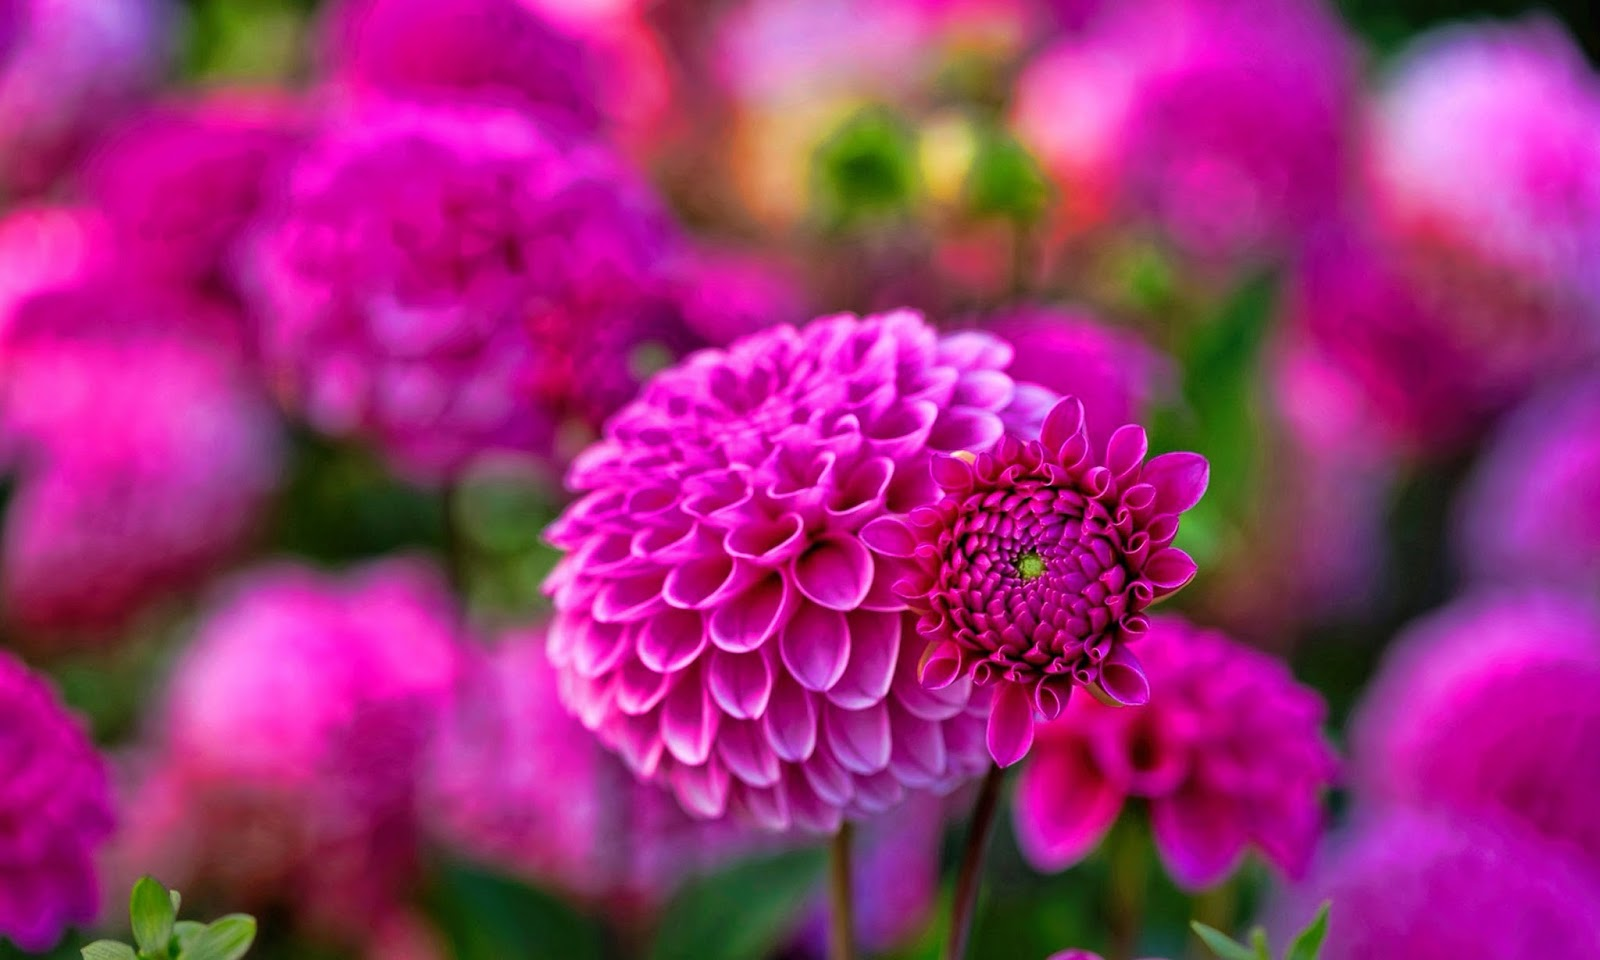 Hd Flower Backgrounds: Dahlia Flower HD Wallpapers